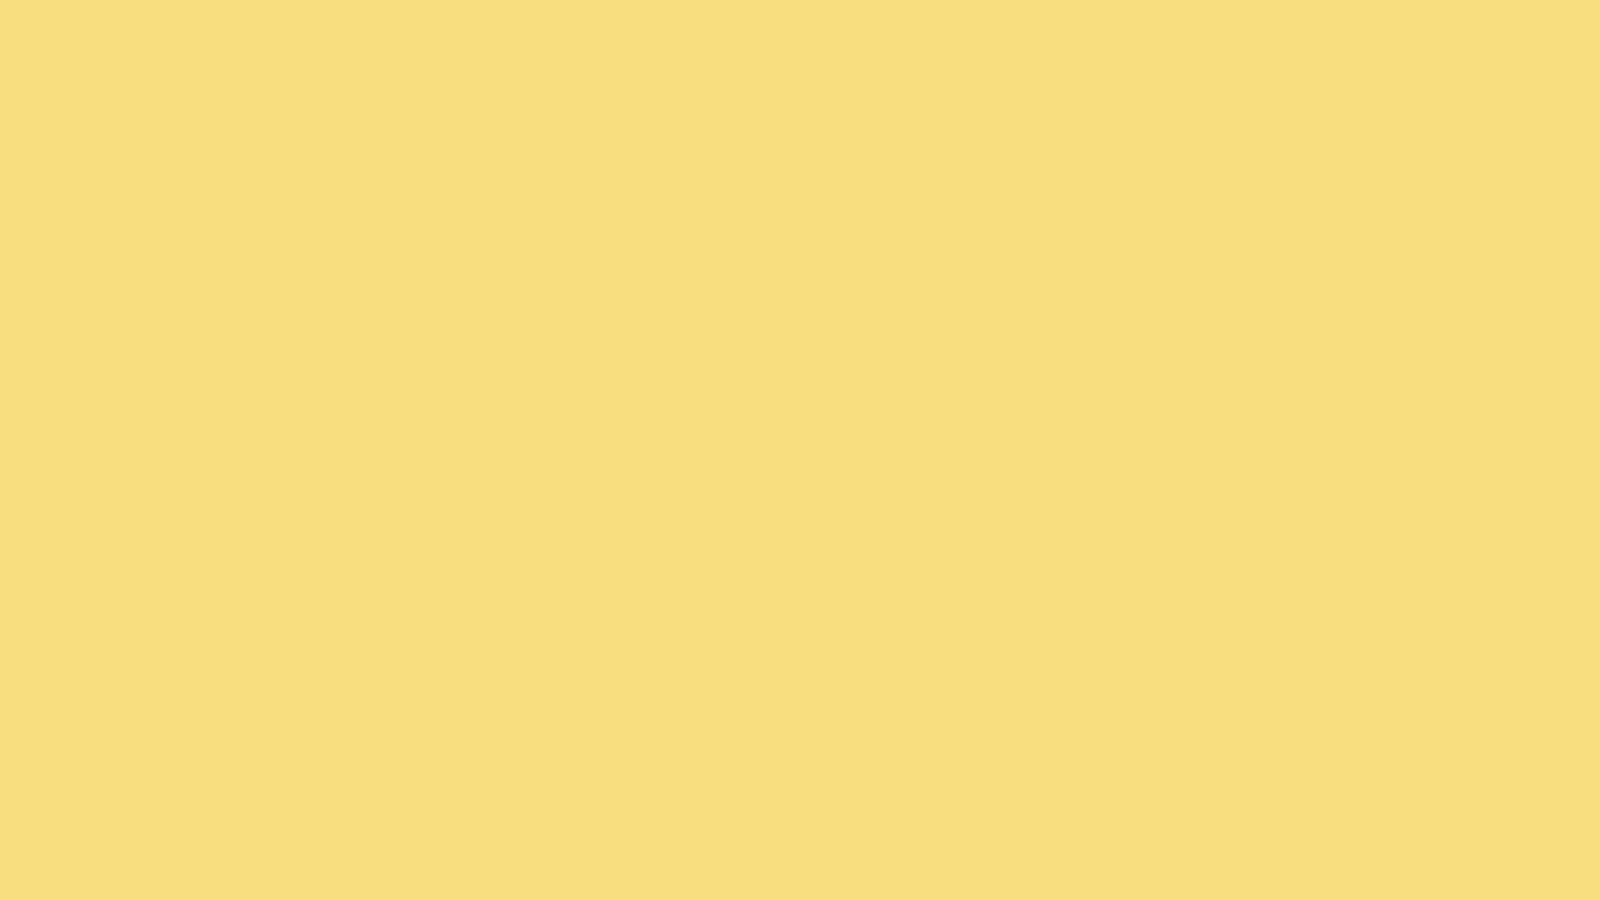 1600x900 Jasmine Solid Color Background